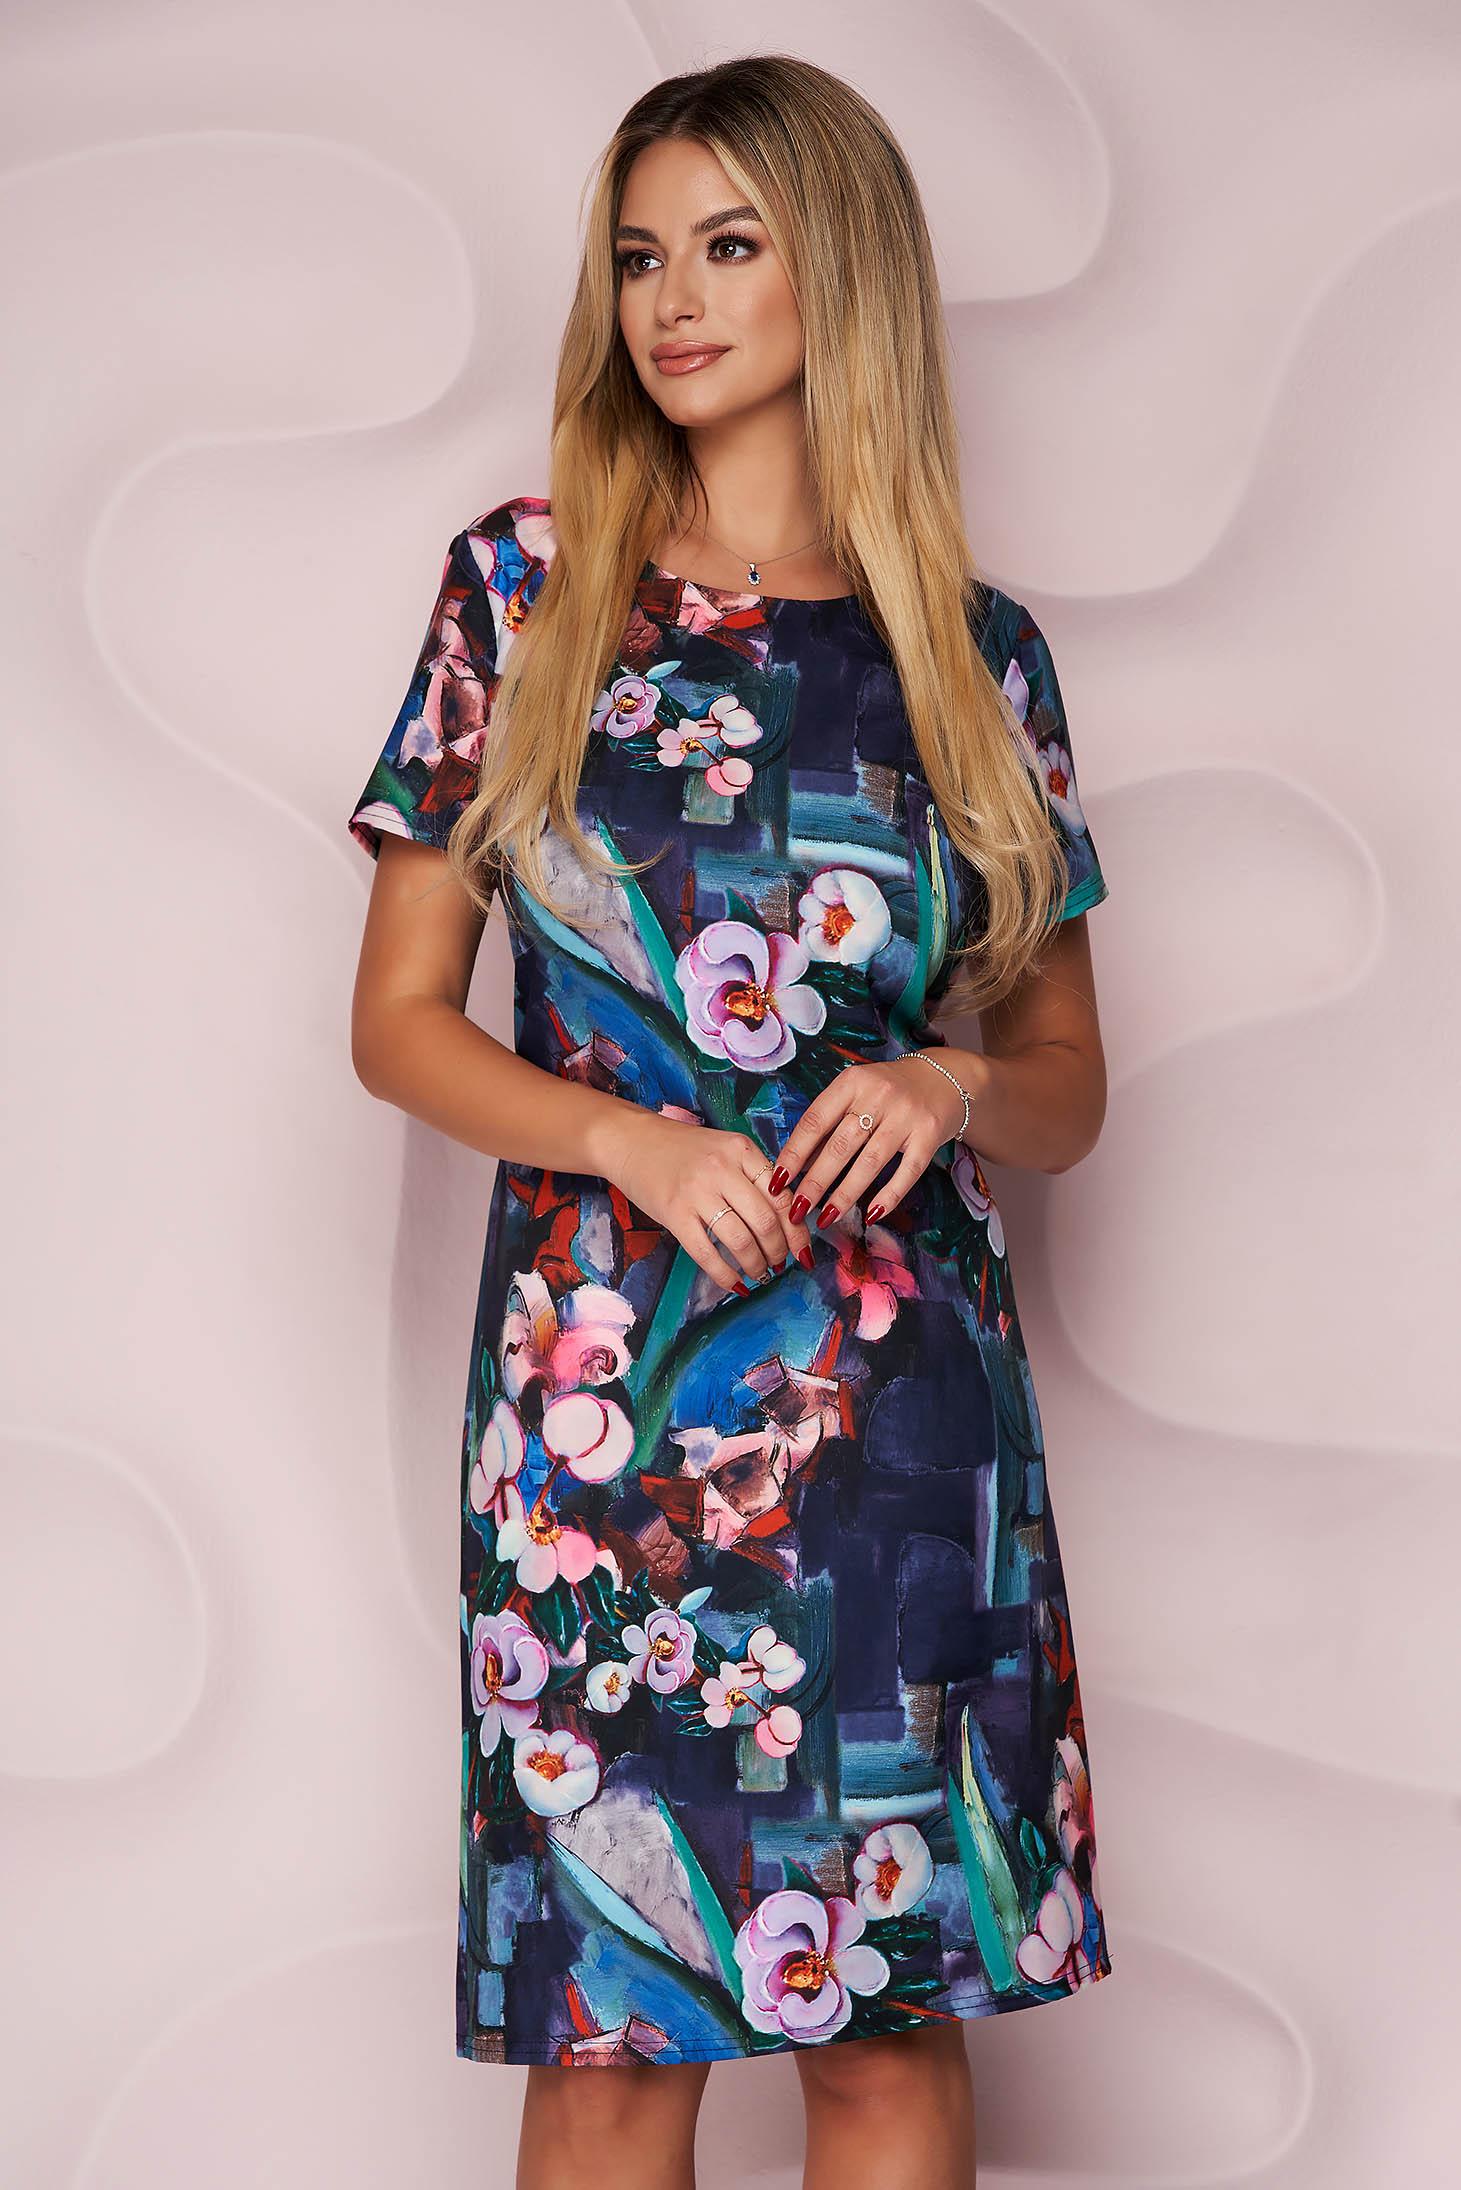 Lady Pandora rochie midi office cu un croi drept din material fluid neelastic si fin la atingere